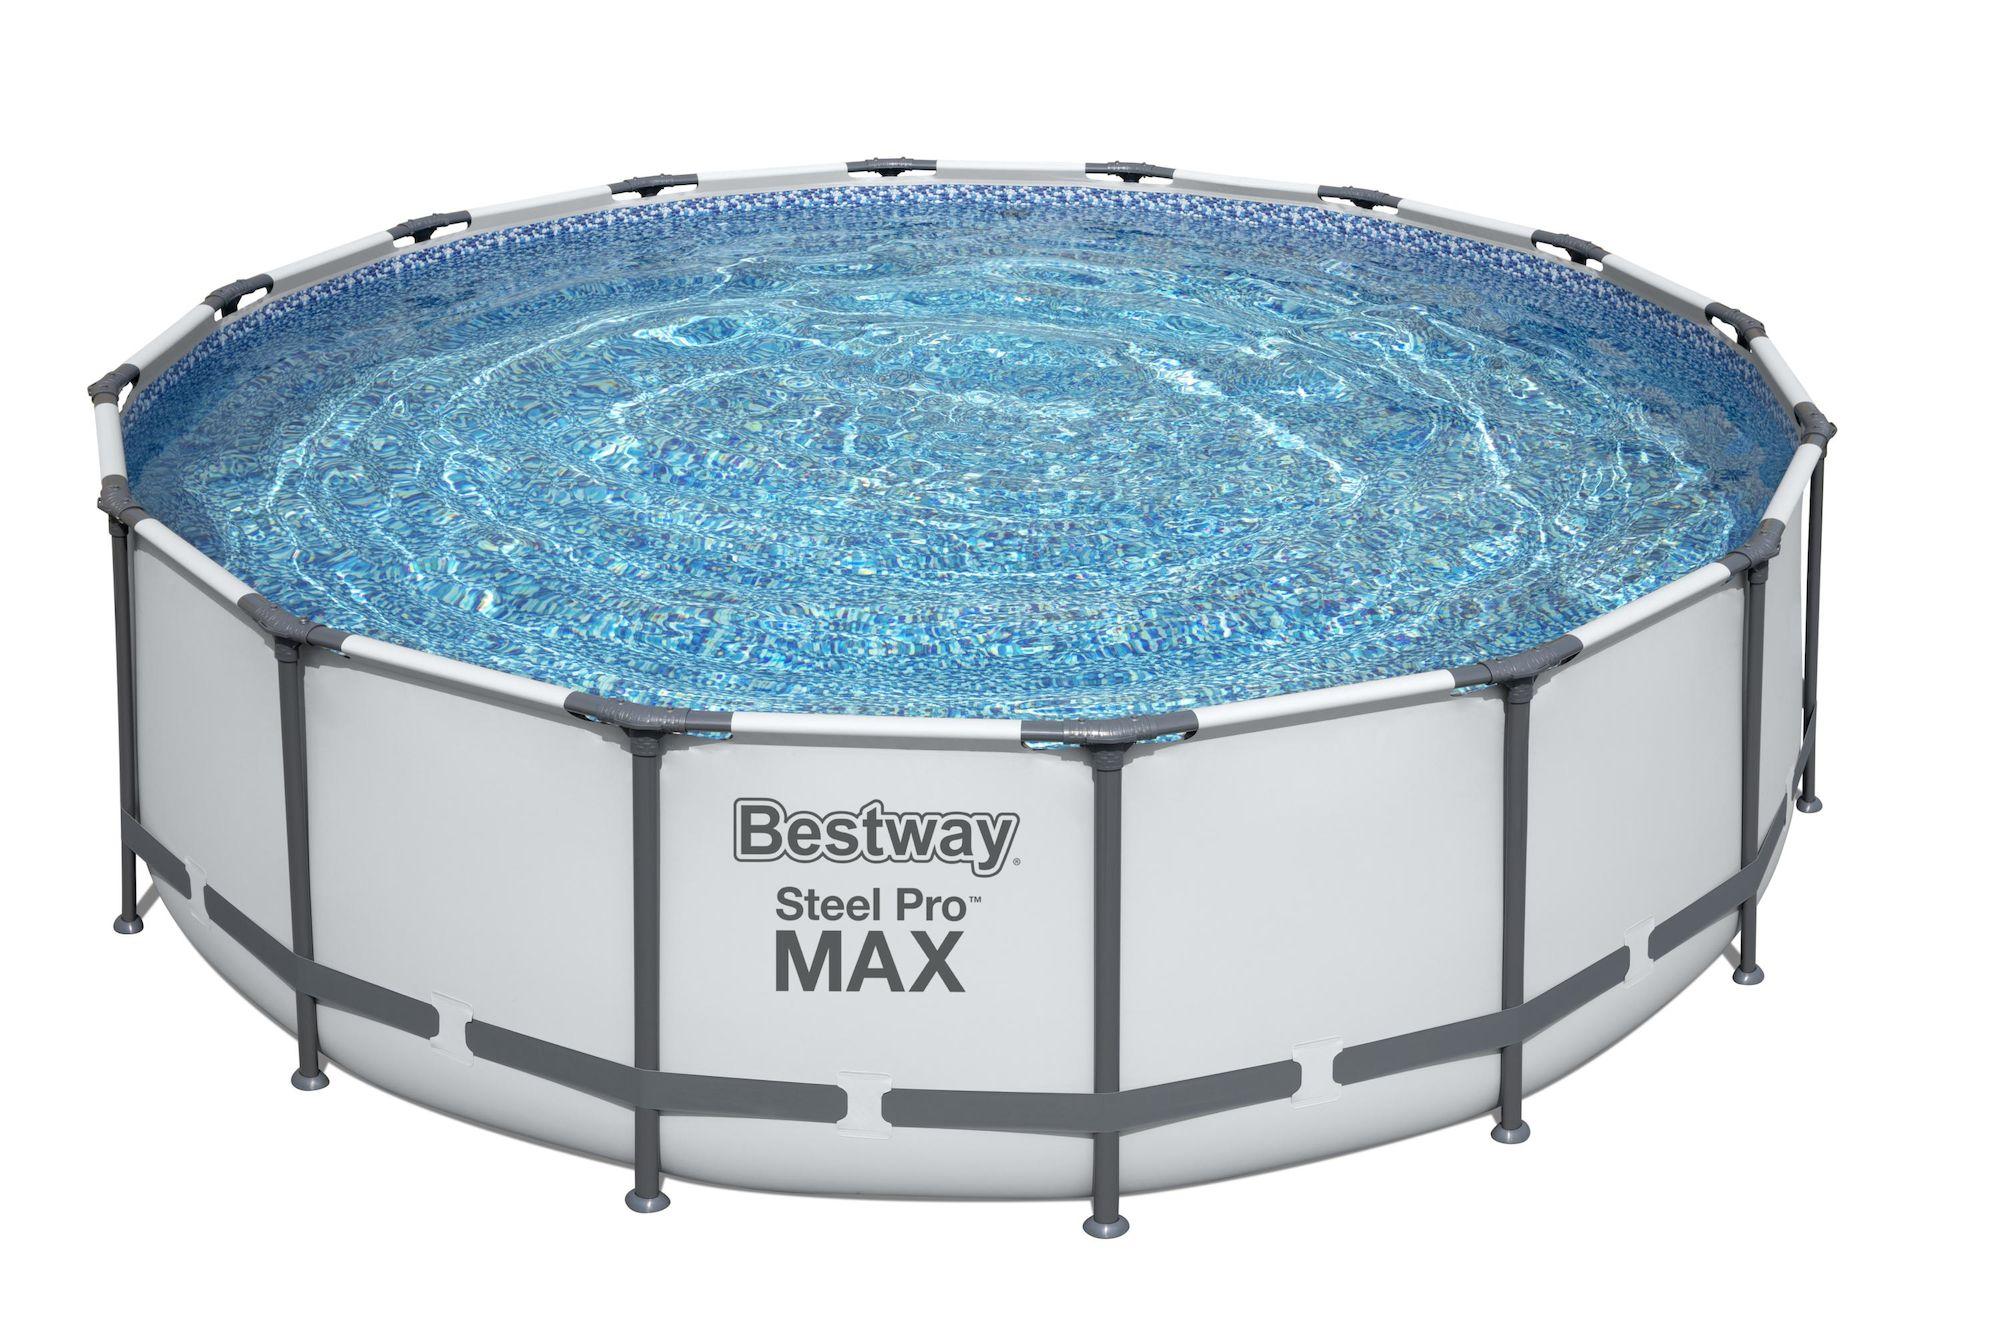 Bestway Steel Pro MAX Pool m. Tillbehör 4.88m x 1.22m